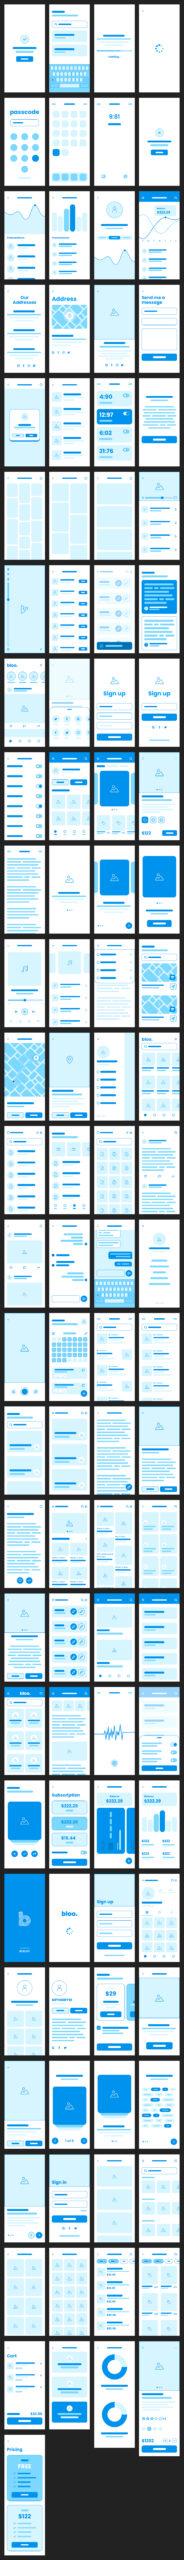 Bloo免费APP设计线框图UI套件插图